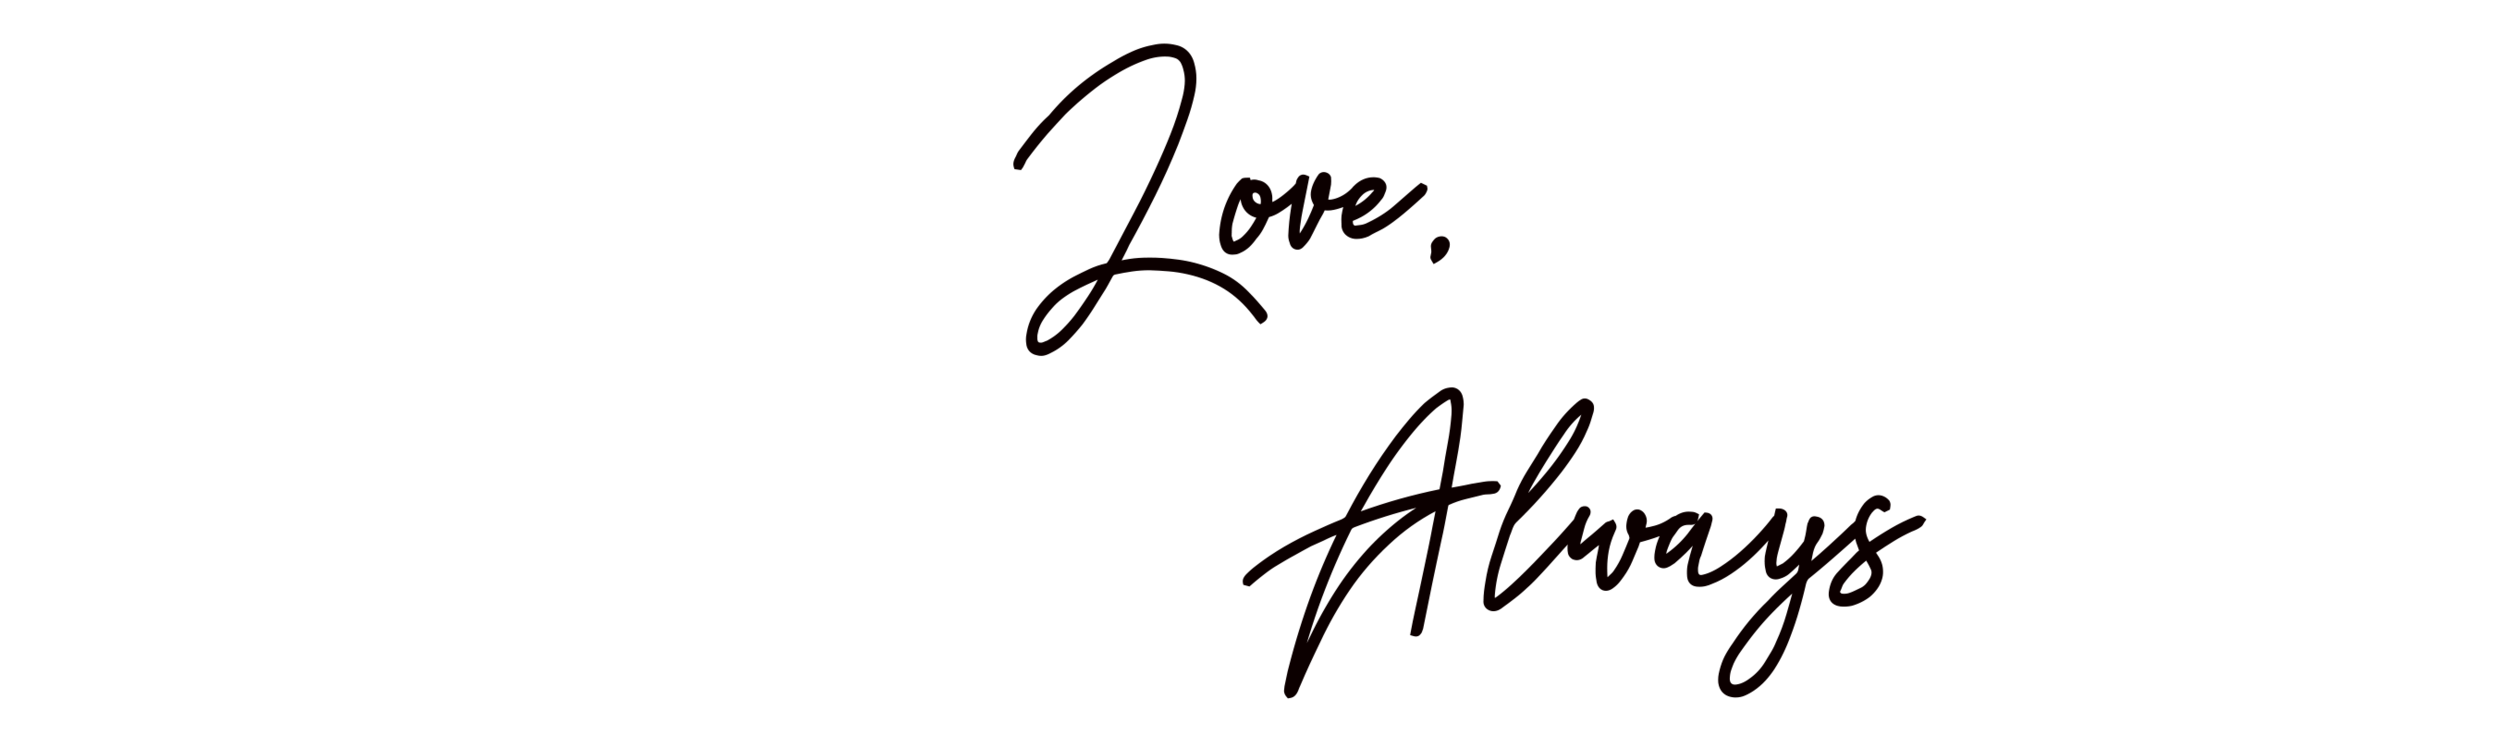 Love,always.png